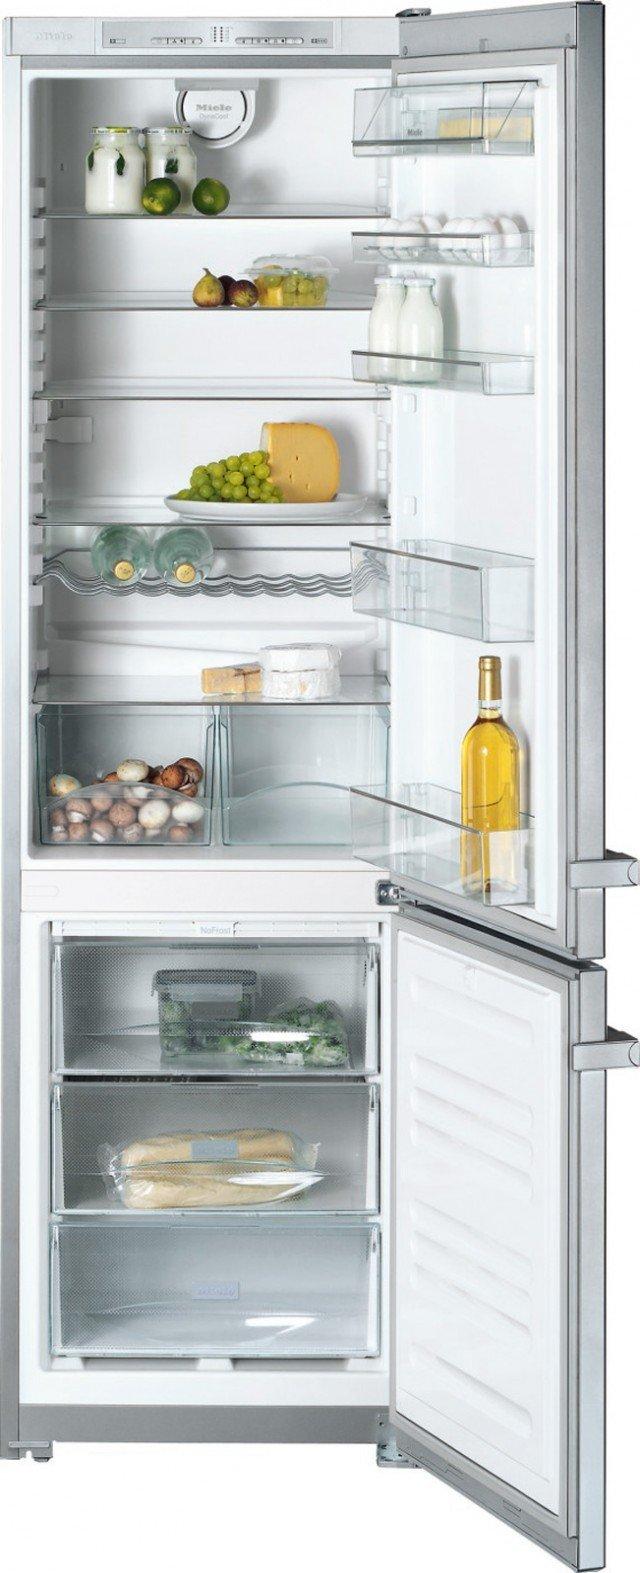 3miele-kfn12923sd-frigorifero